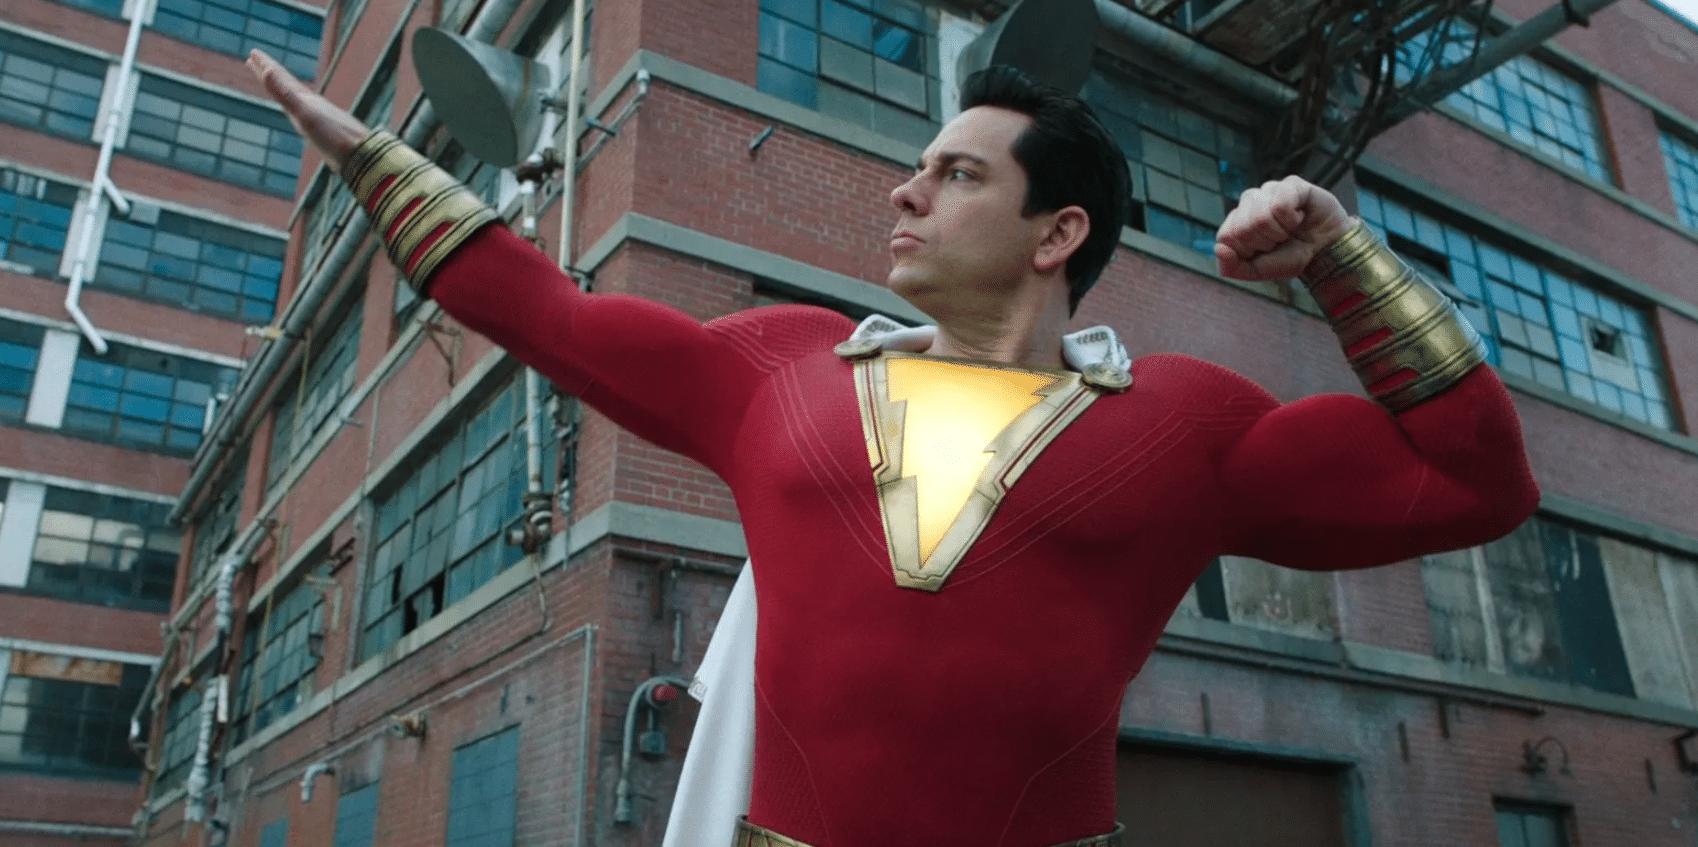 Shazam 2 Looks To Start Filming Spring 2021: Exclusive - The Illuminerdi